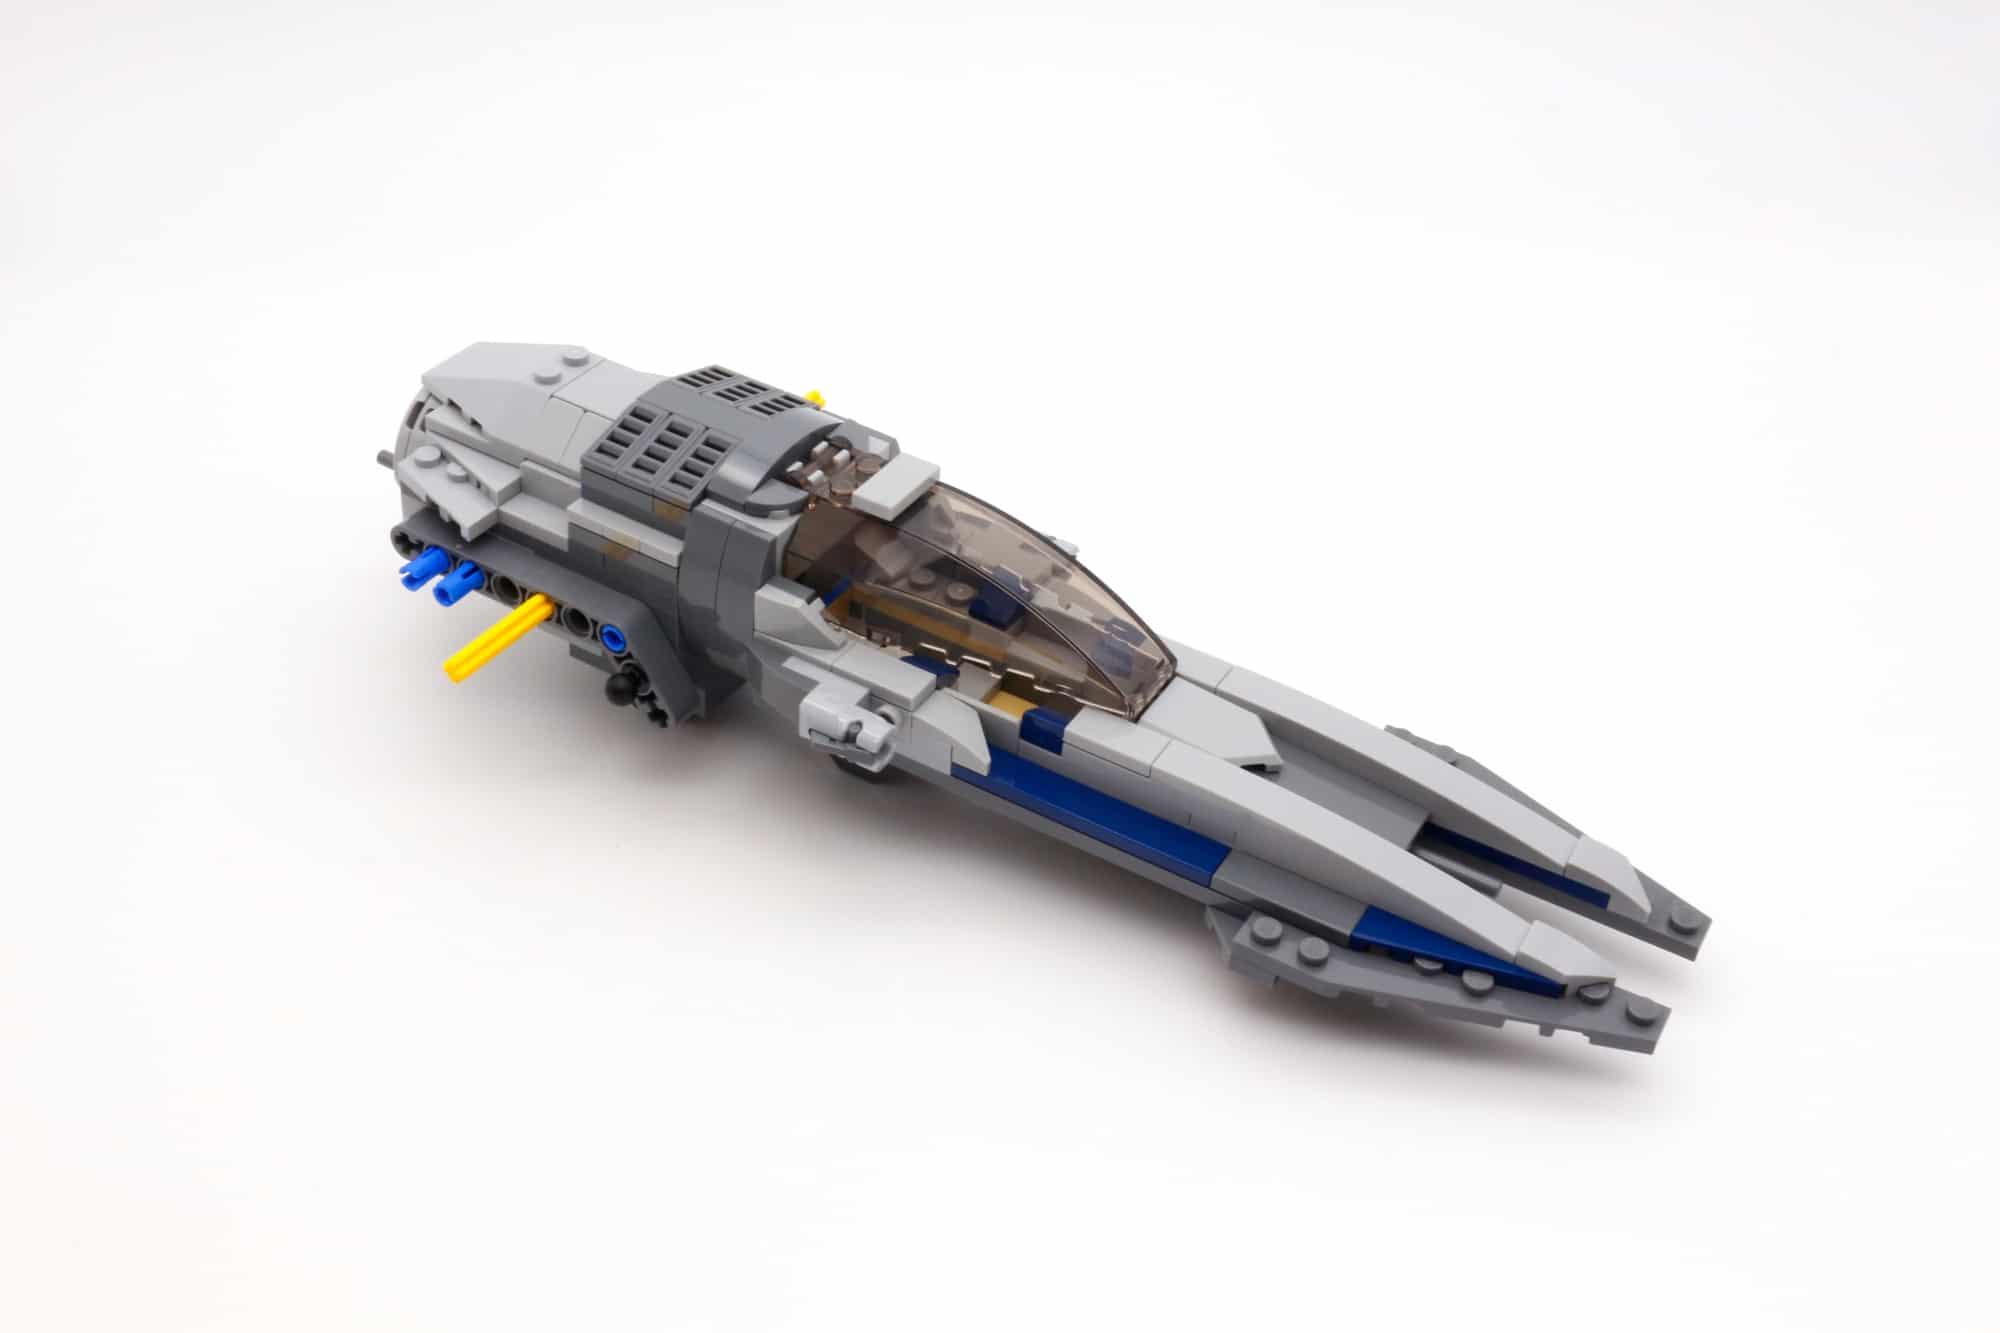 LEGO Star Wars 75316 Mandalorian Starfighter 23